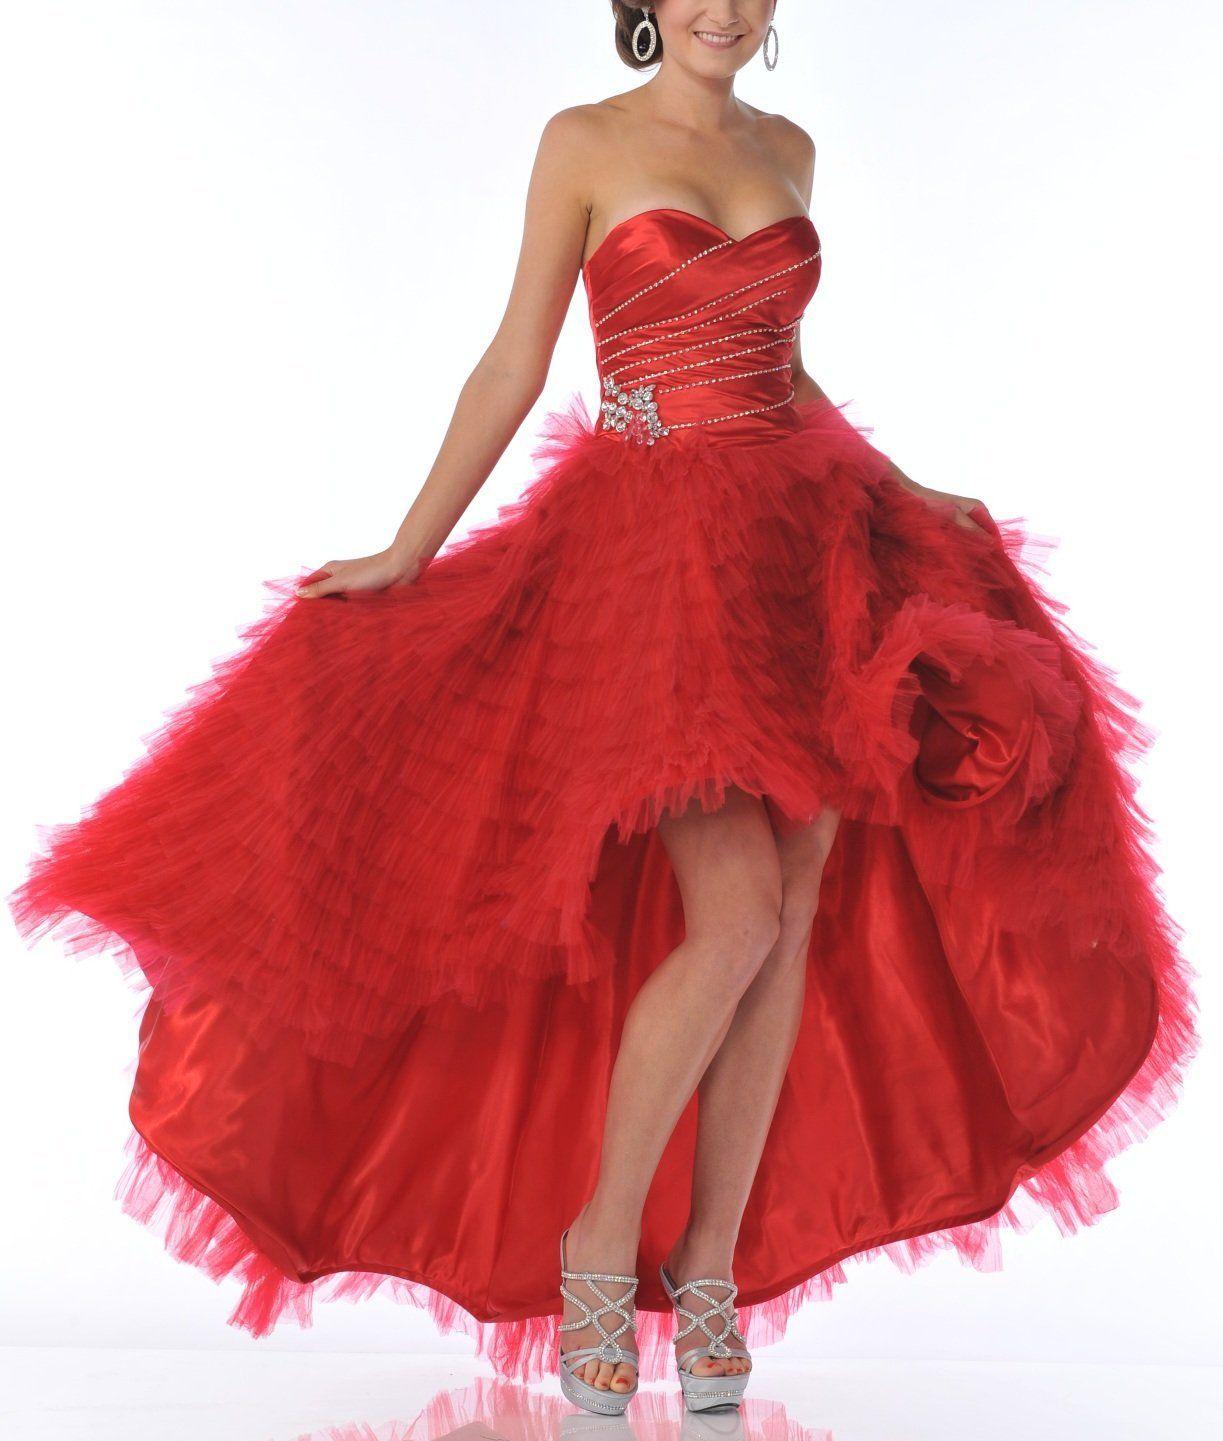 Zeilei Sweetheart Strapless Ruffle Pageant Prom Dress